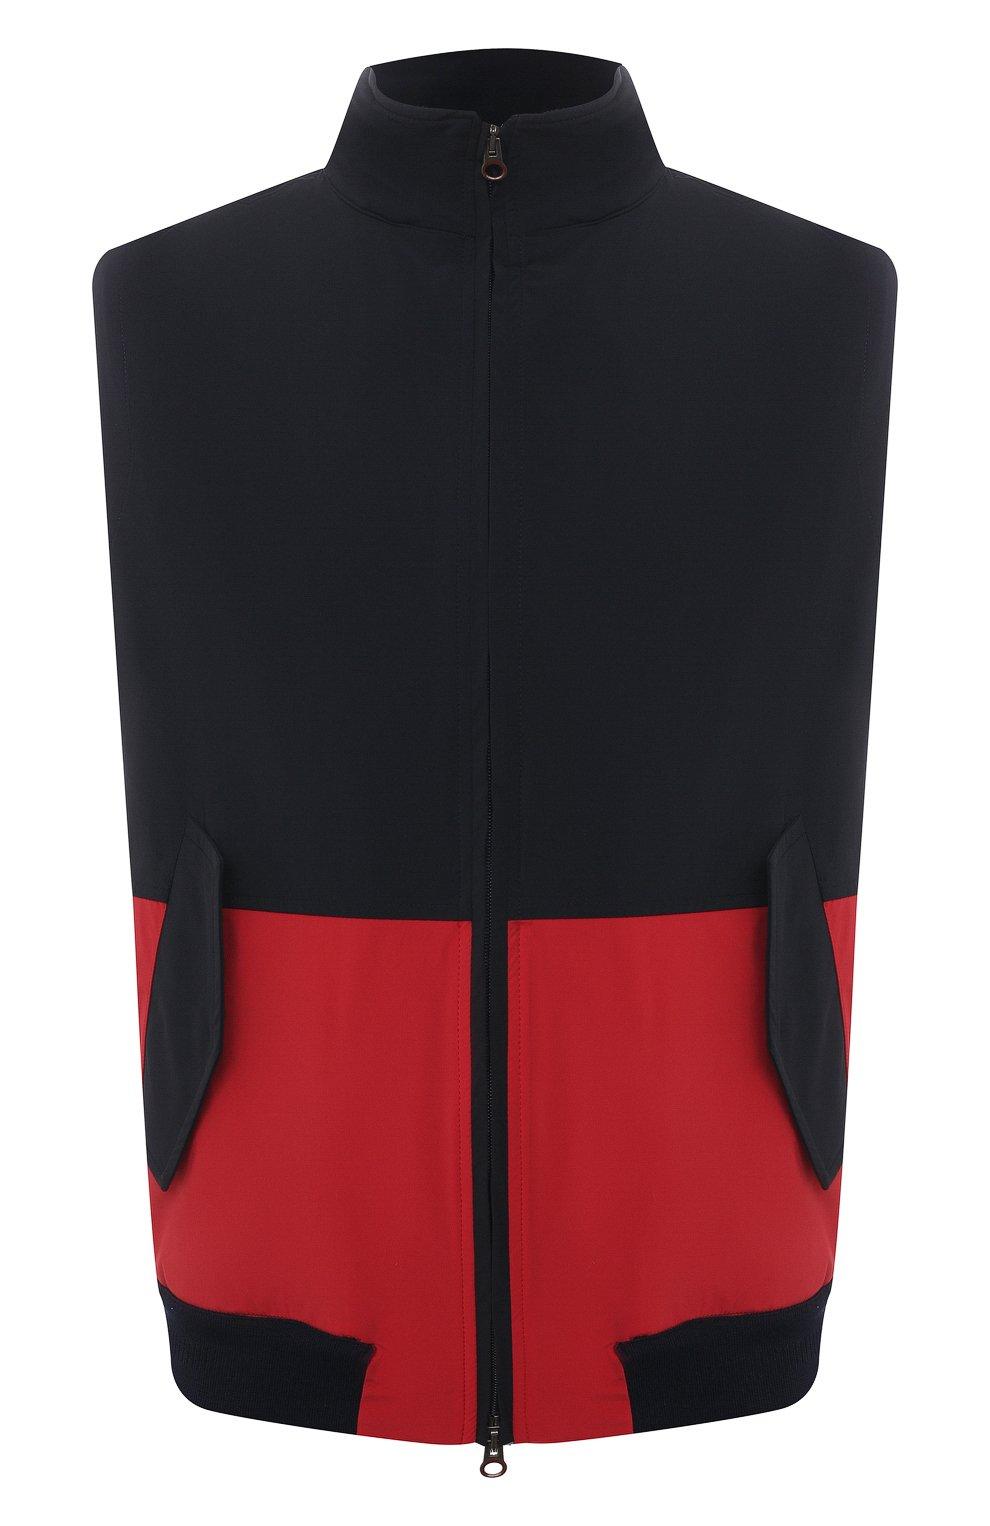 Мужской жилет KIRED темно-синего цвета, арт. WMAXBSMW6905003000   Фото 1 (Кросс-КТ: Куртка; Материал внешний: Синтетический материал; Длина (верхняя одежда): Короткие; Стили: Кэжуэл)